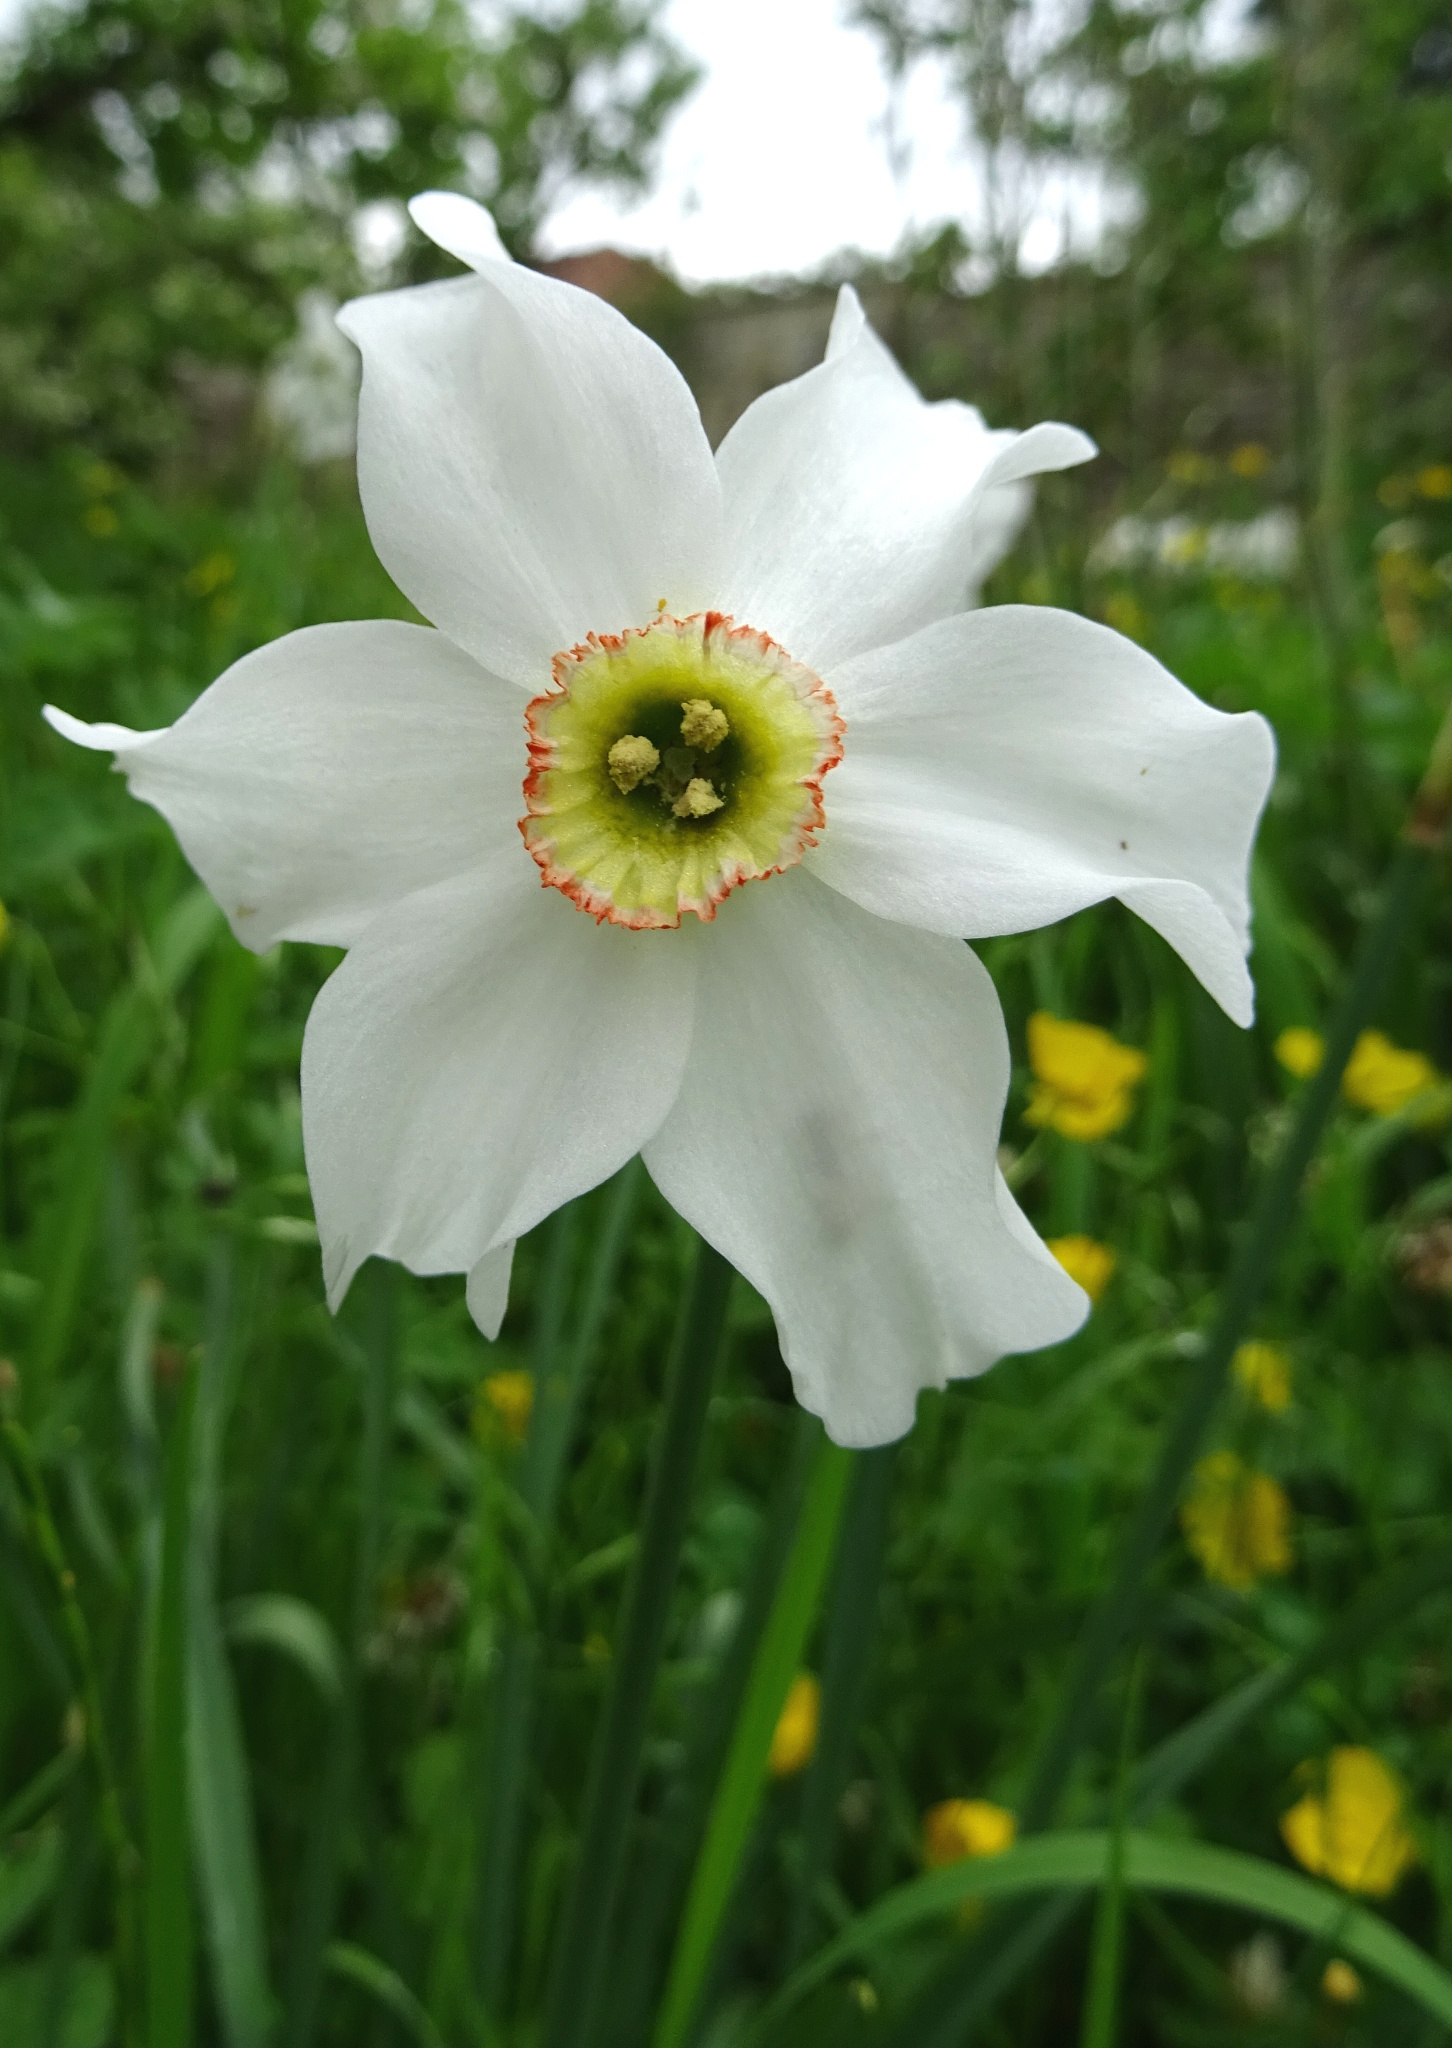 Late Flowering Narcisi by kayThornton